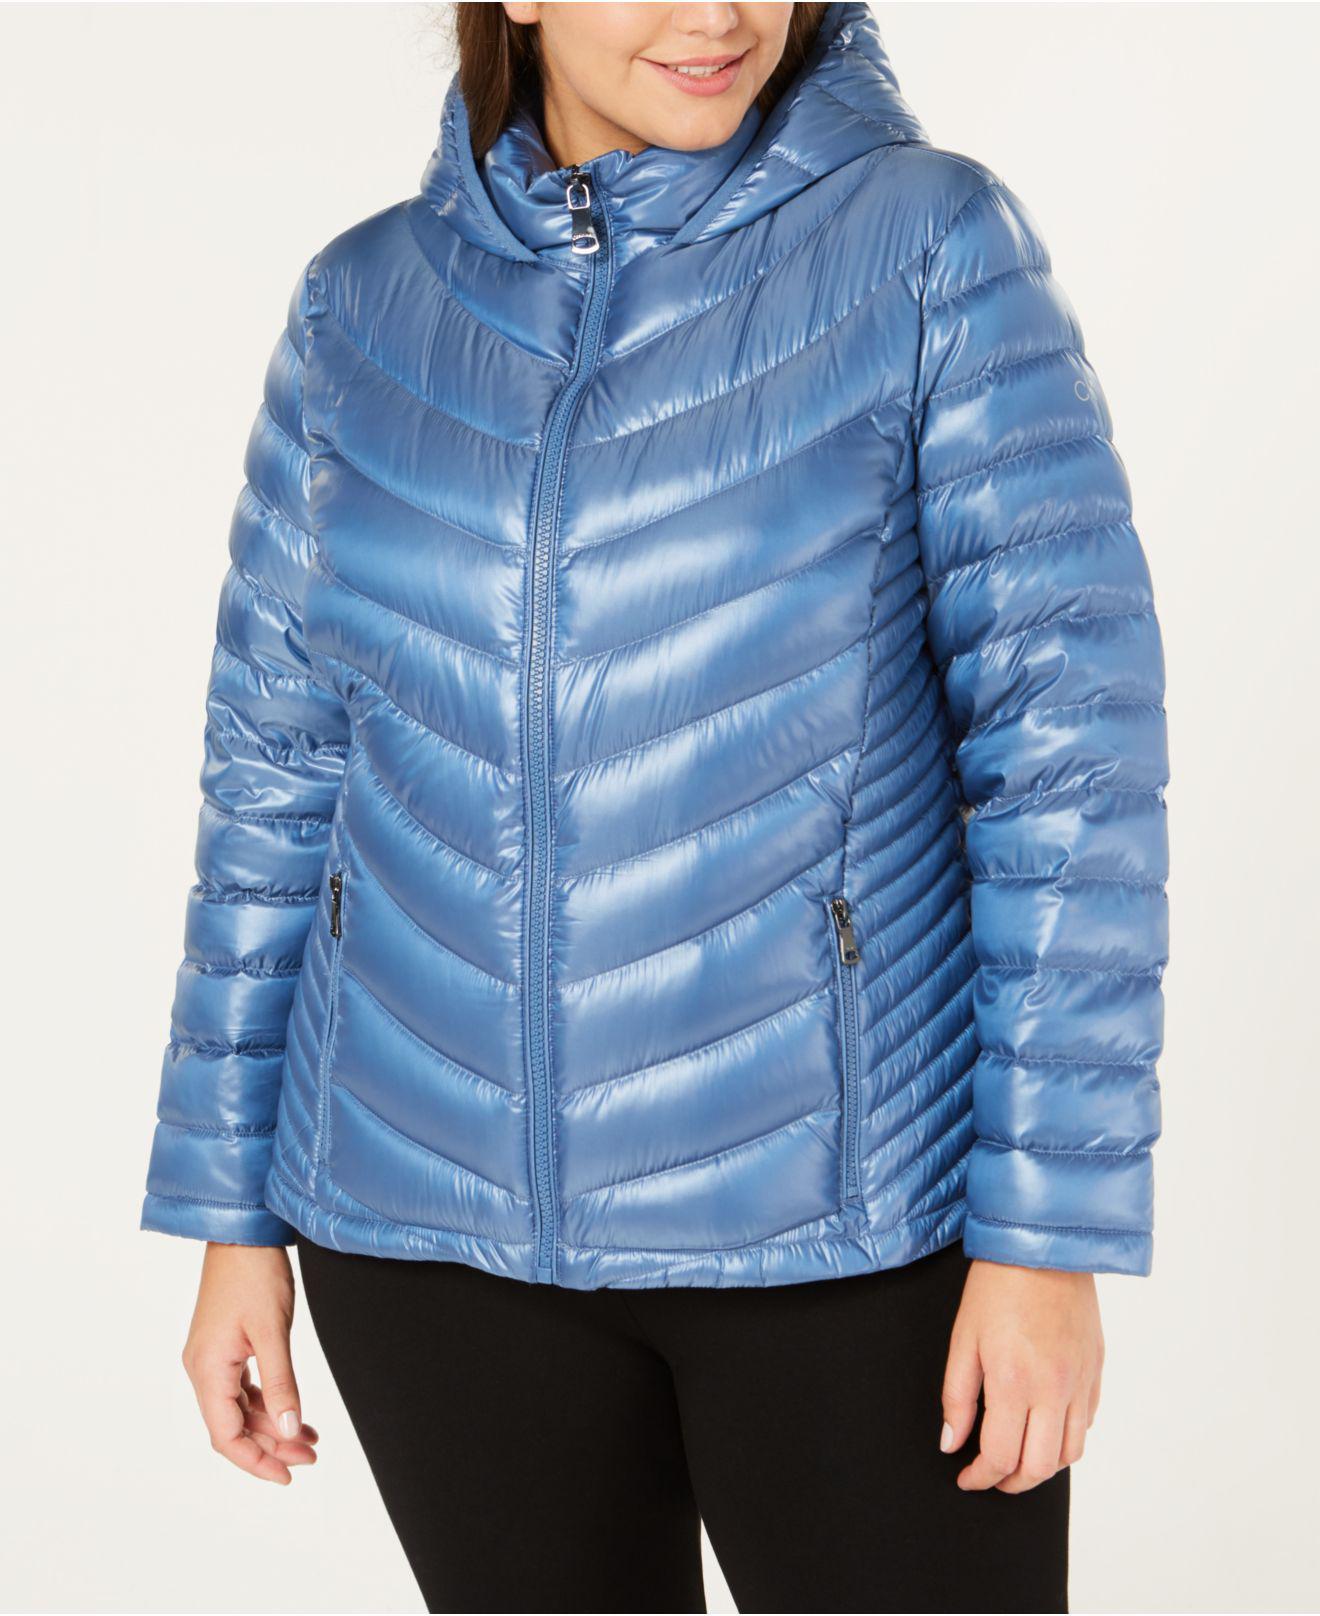 e716c26b7d7 Lyst - Calvin Klein Plus Size Hooded Down Puffer Coat in Blue